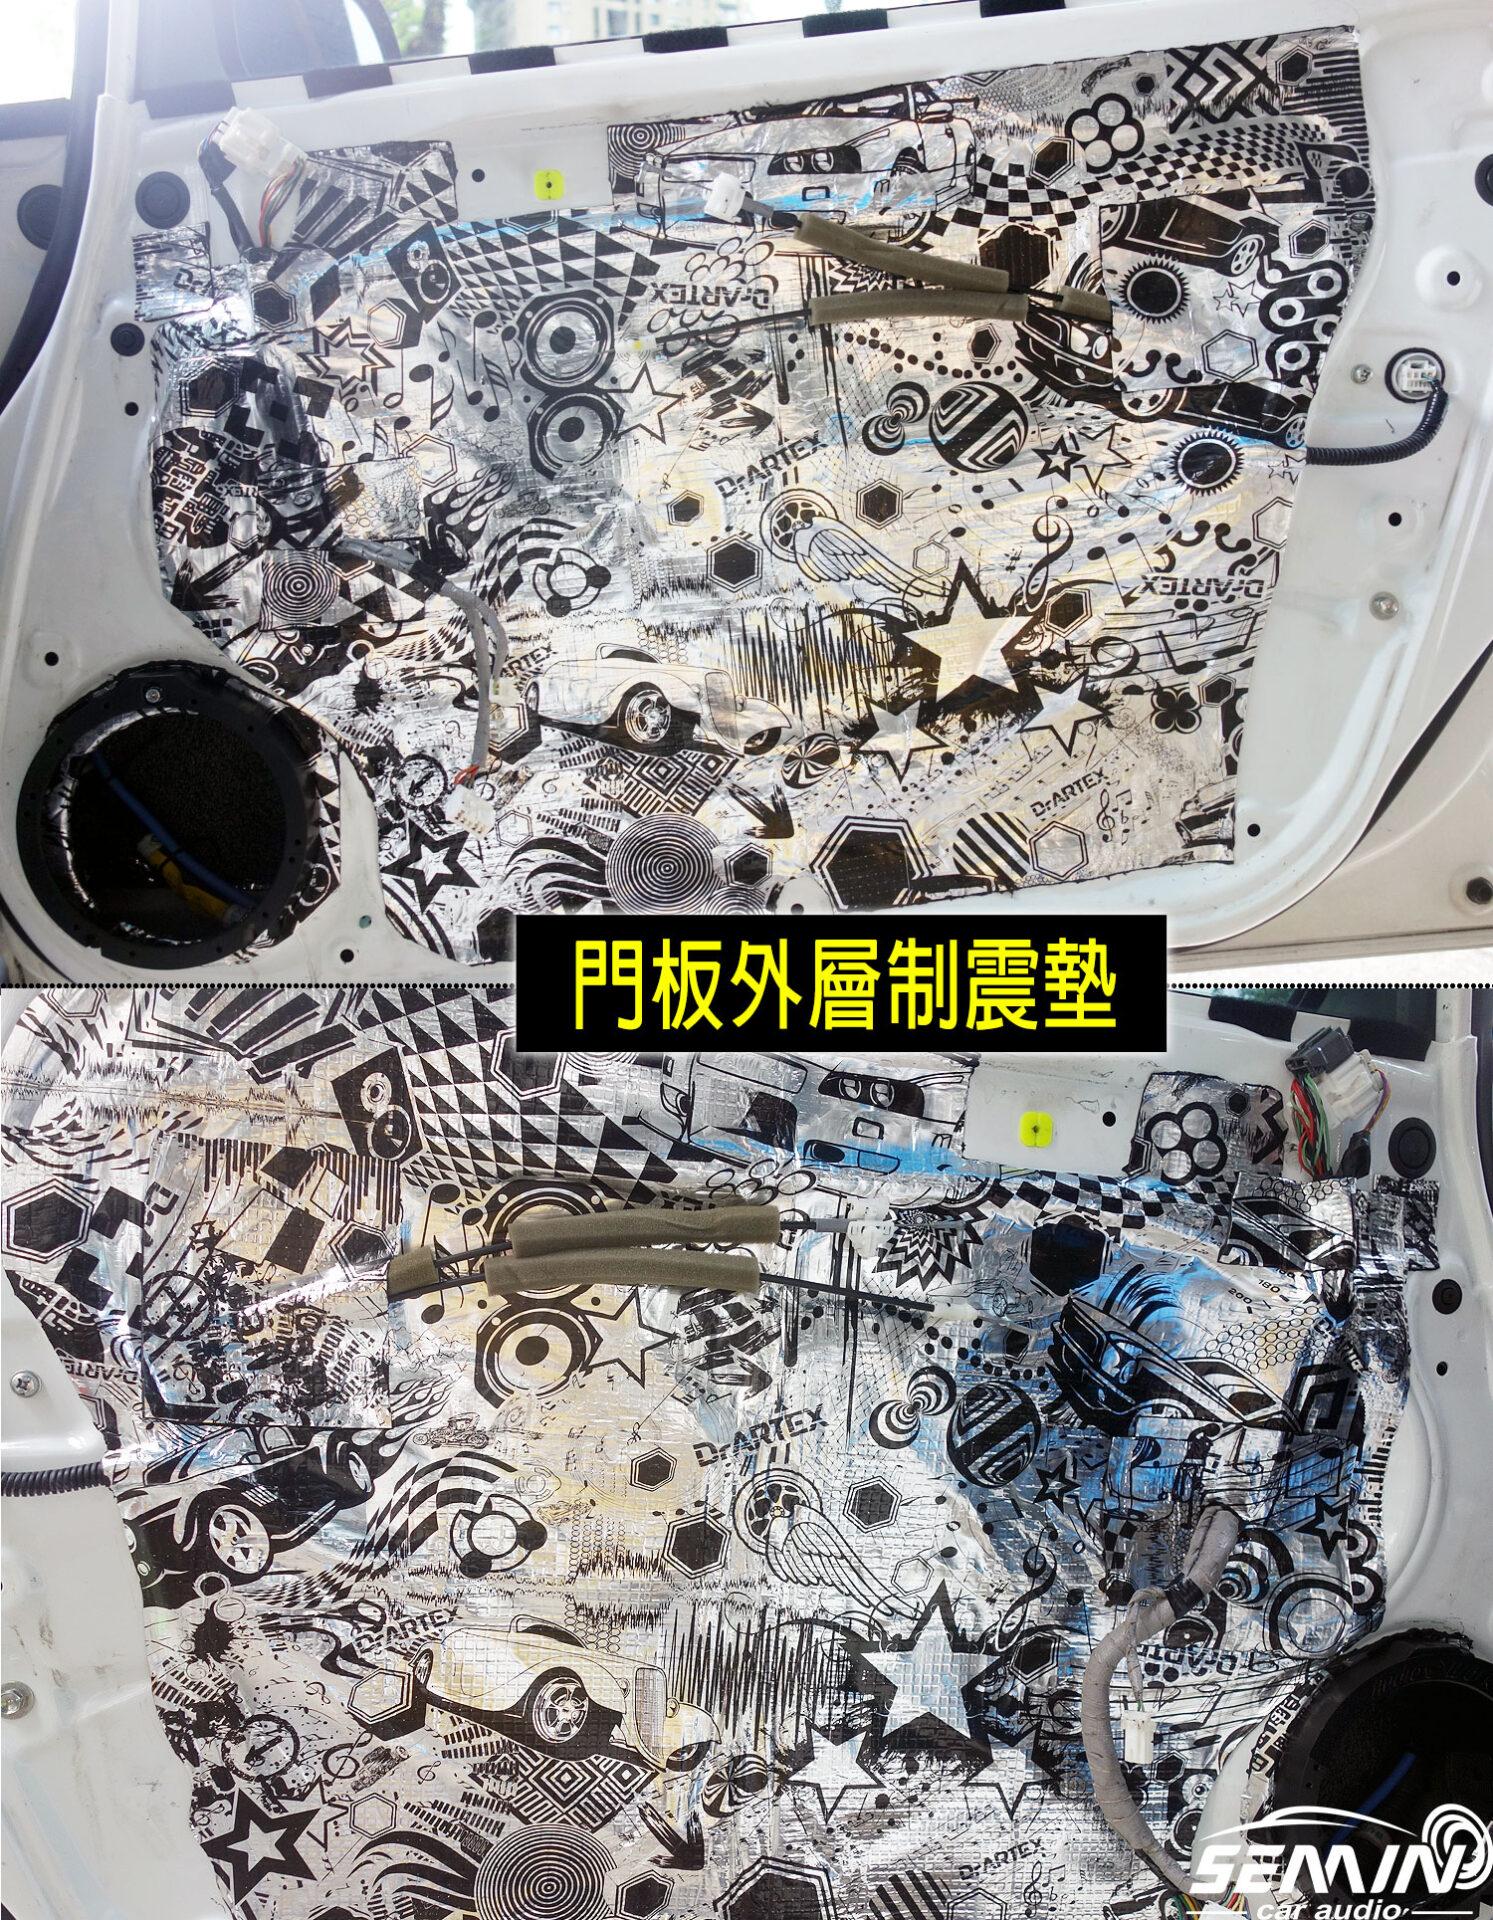 2019 EMMA TAIWAN 比賽車解析 HONDA CIVIC